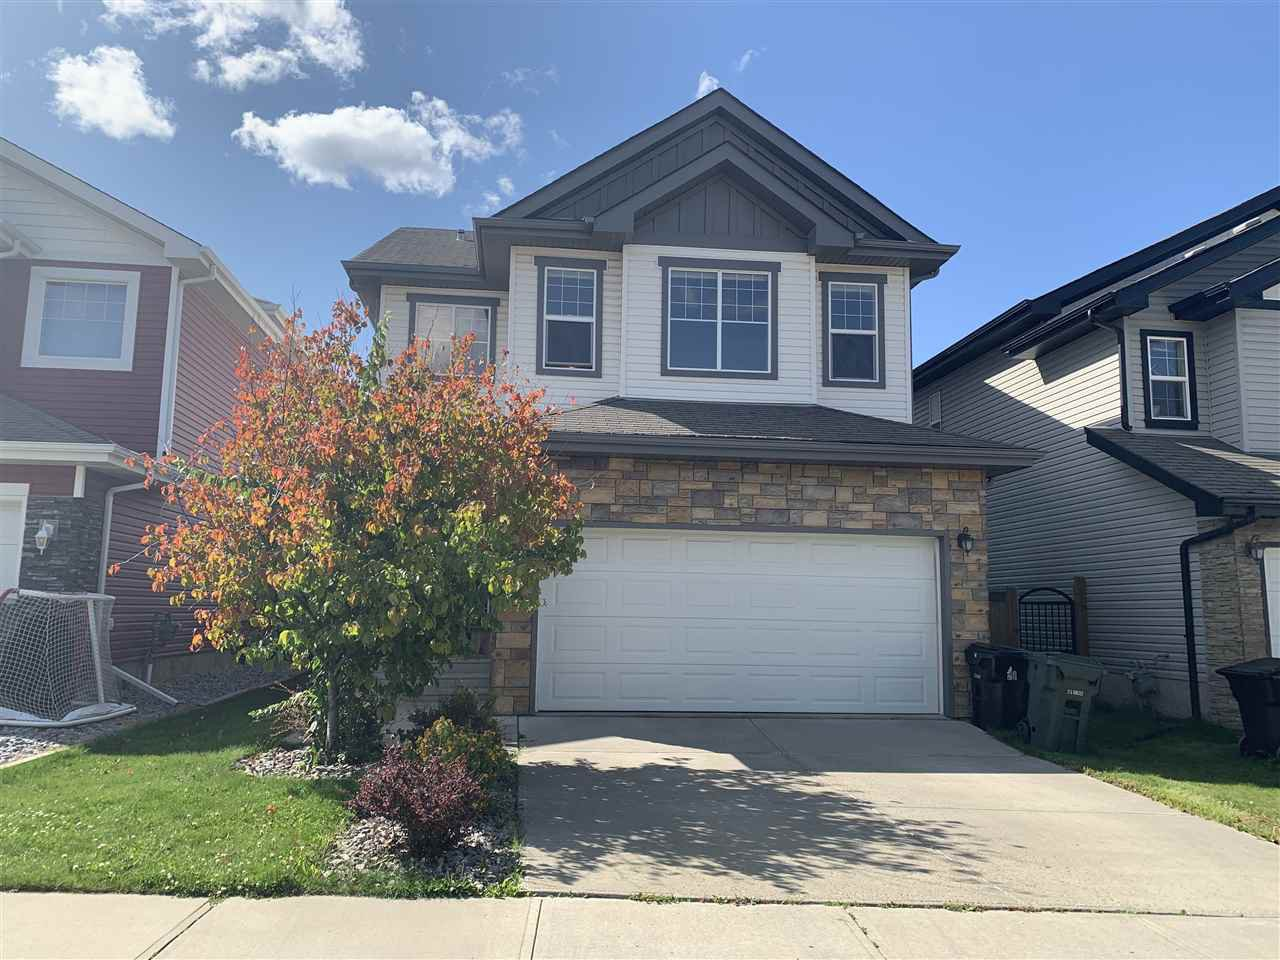 Main Photo: 3 VERNON Street: Spruce Grove House for sale : MLS®# E4171223